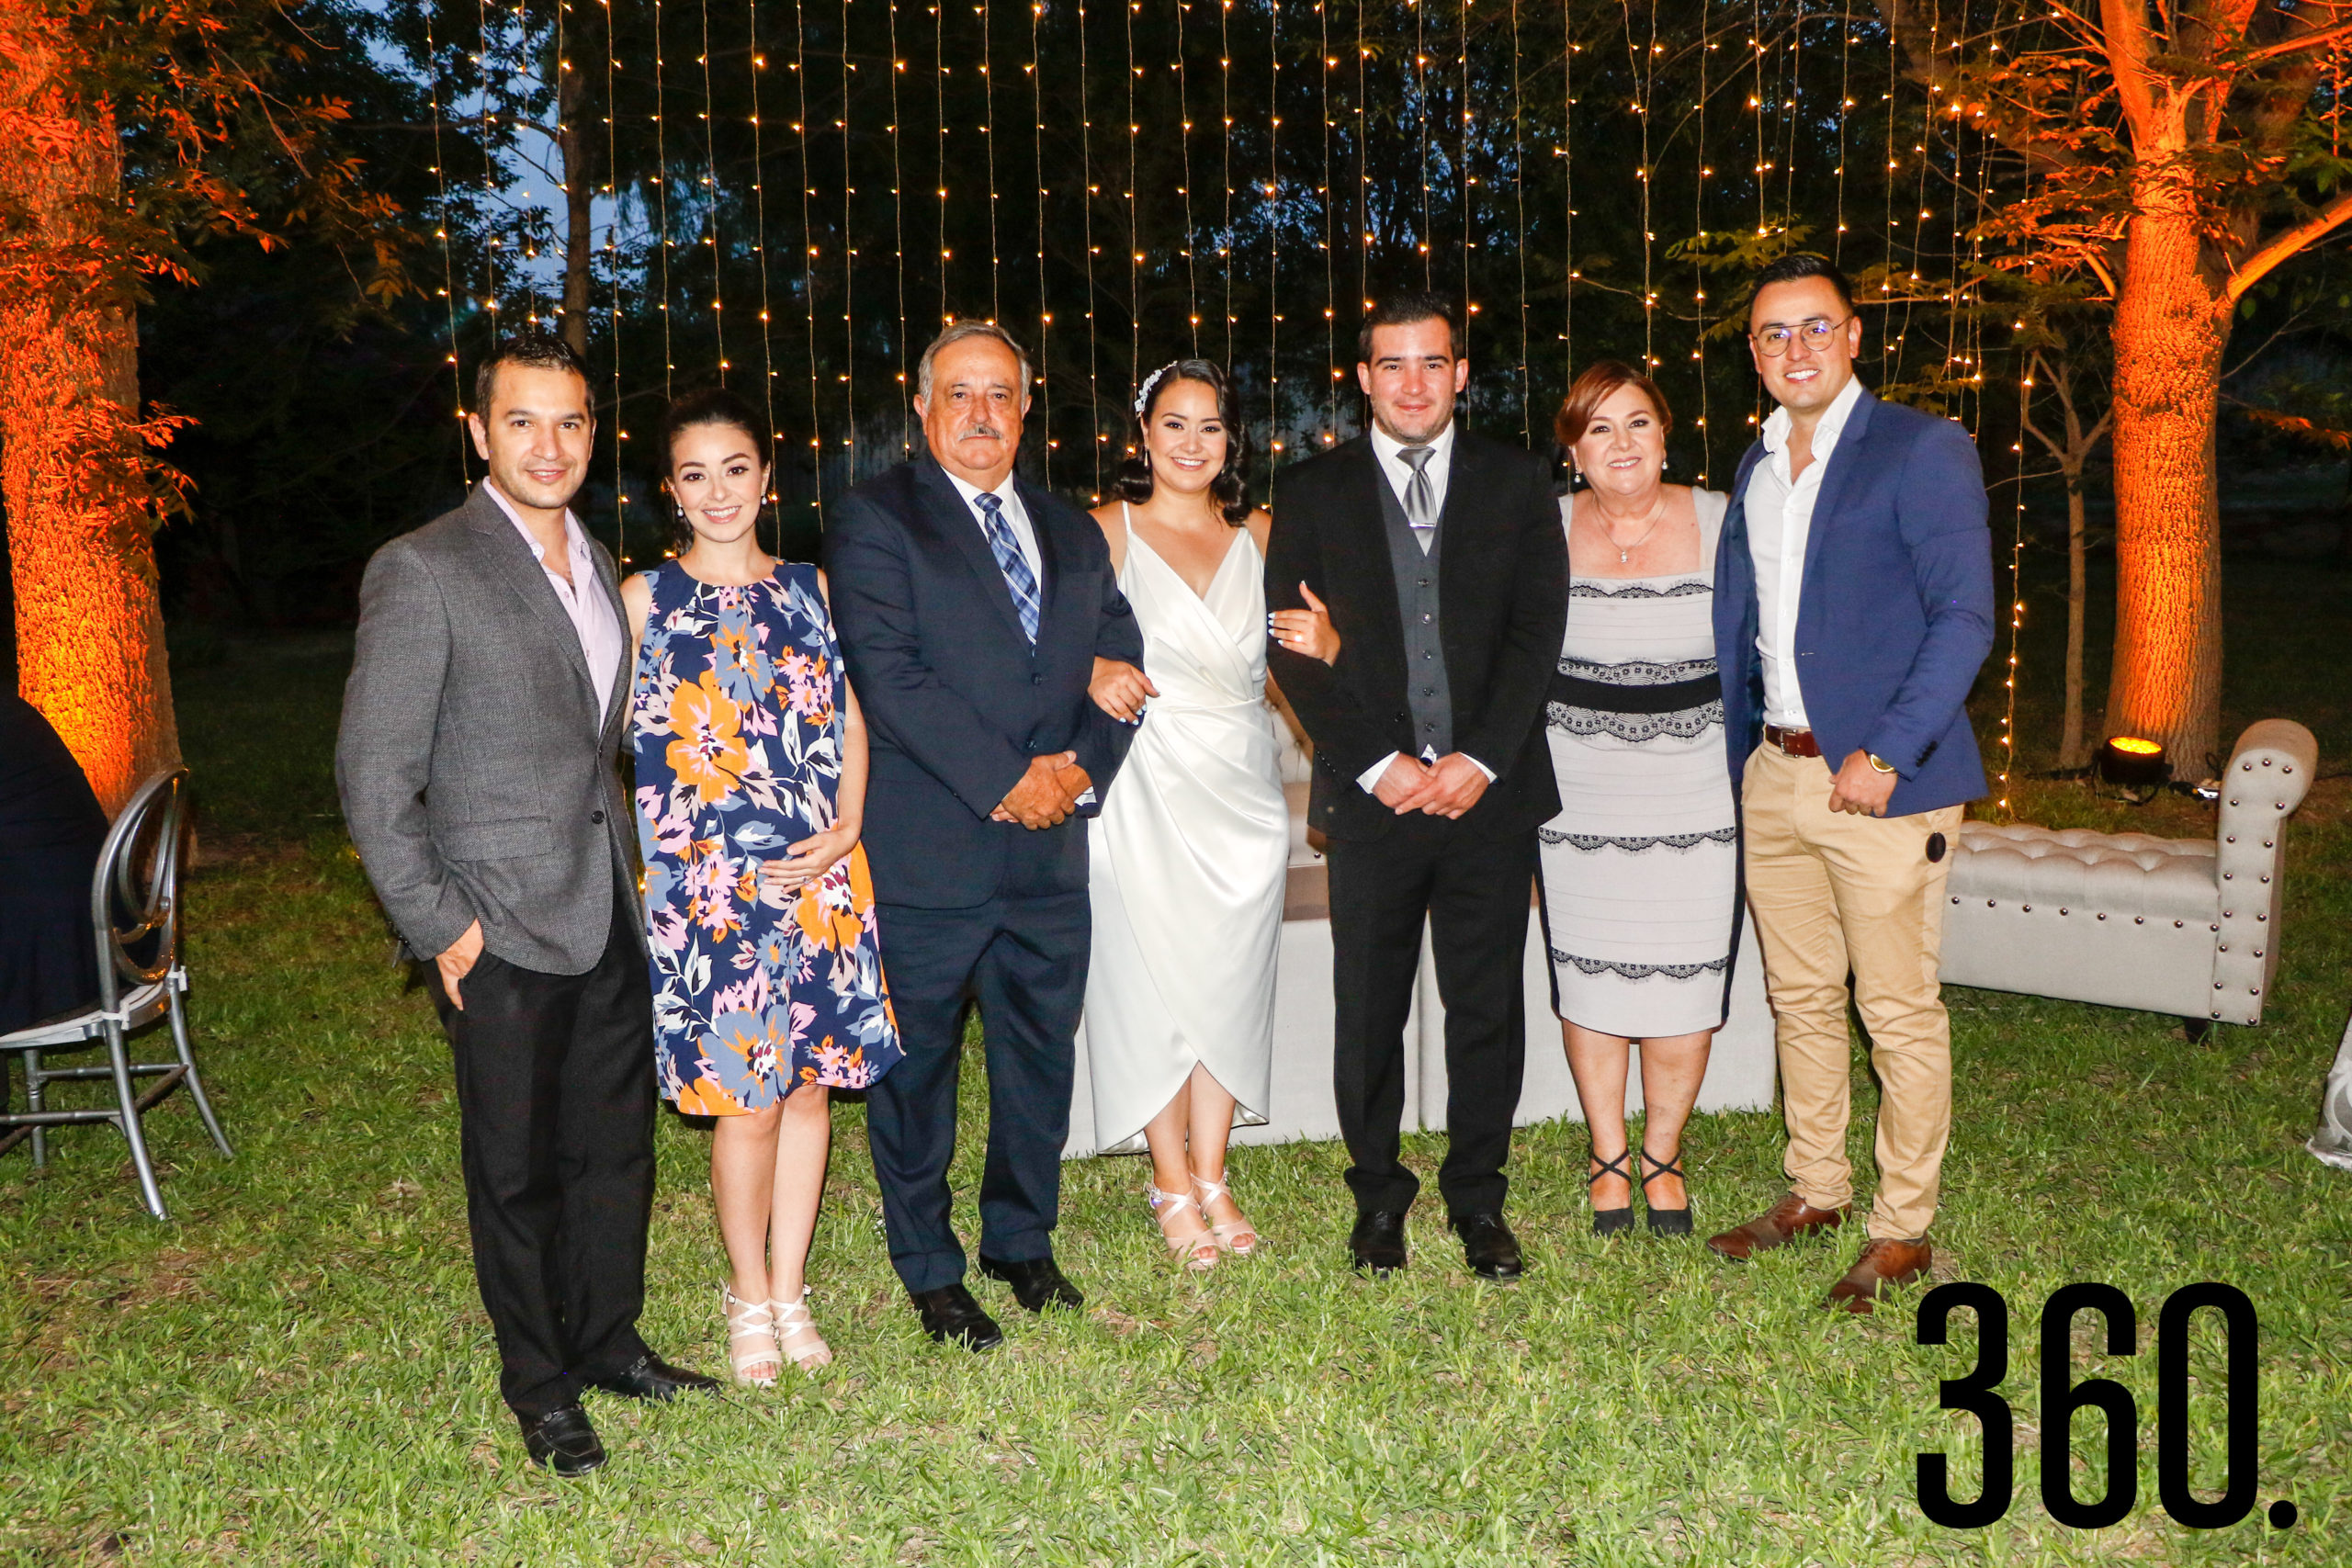 Miguel Sierra, Yoyis Rangel, Mario Rangel, Paulina Rangel, Gaspar Reyes, Gloria Aguirre y Mario Rangel.